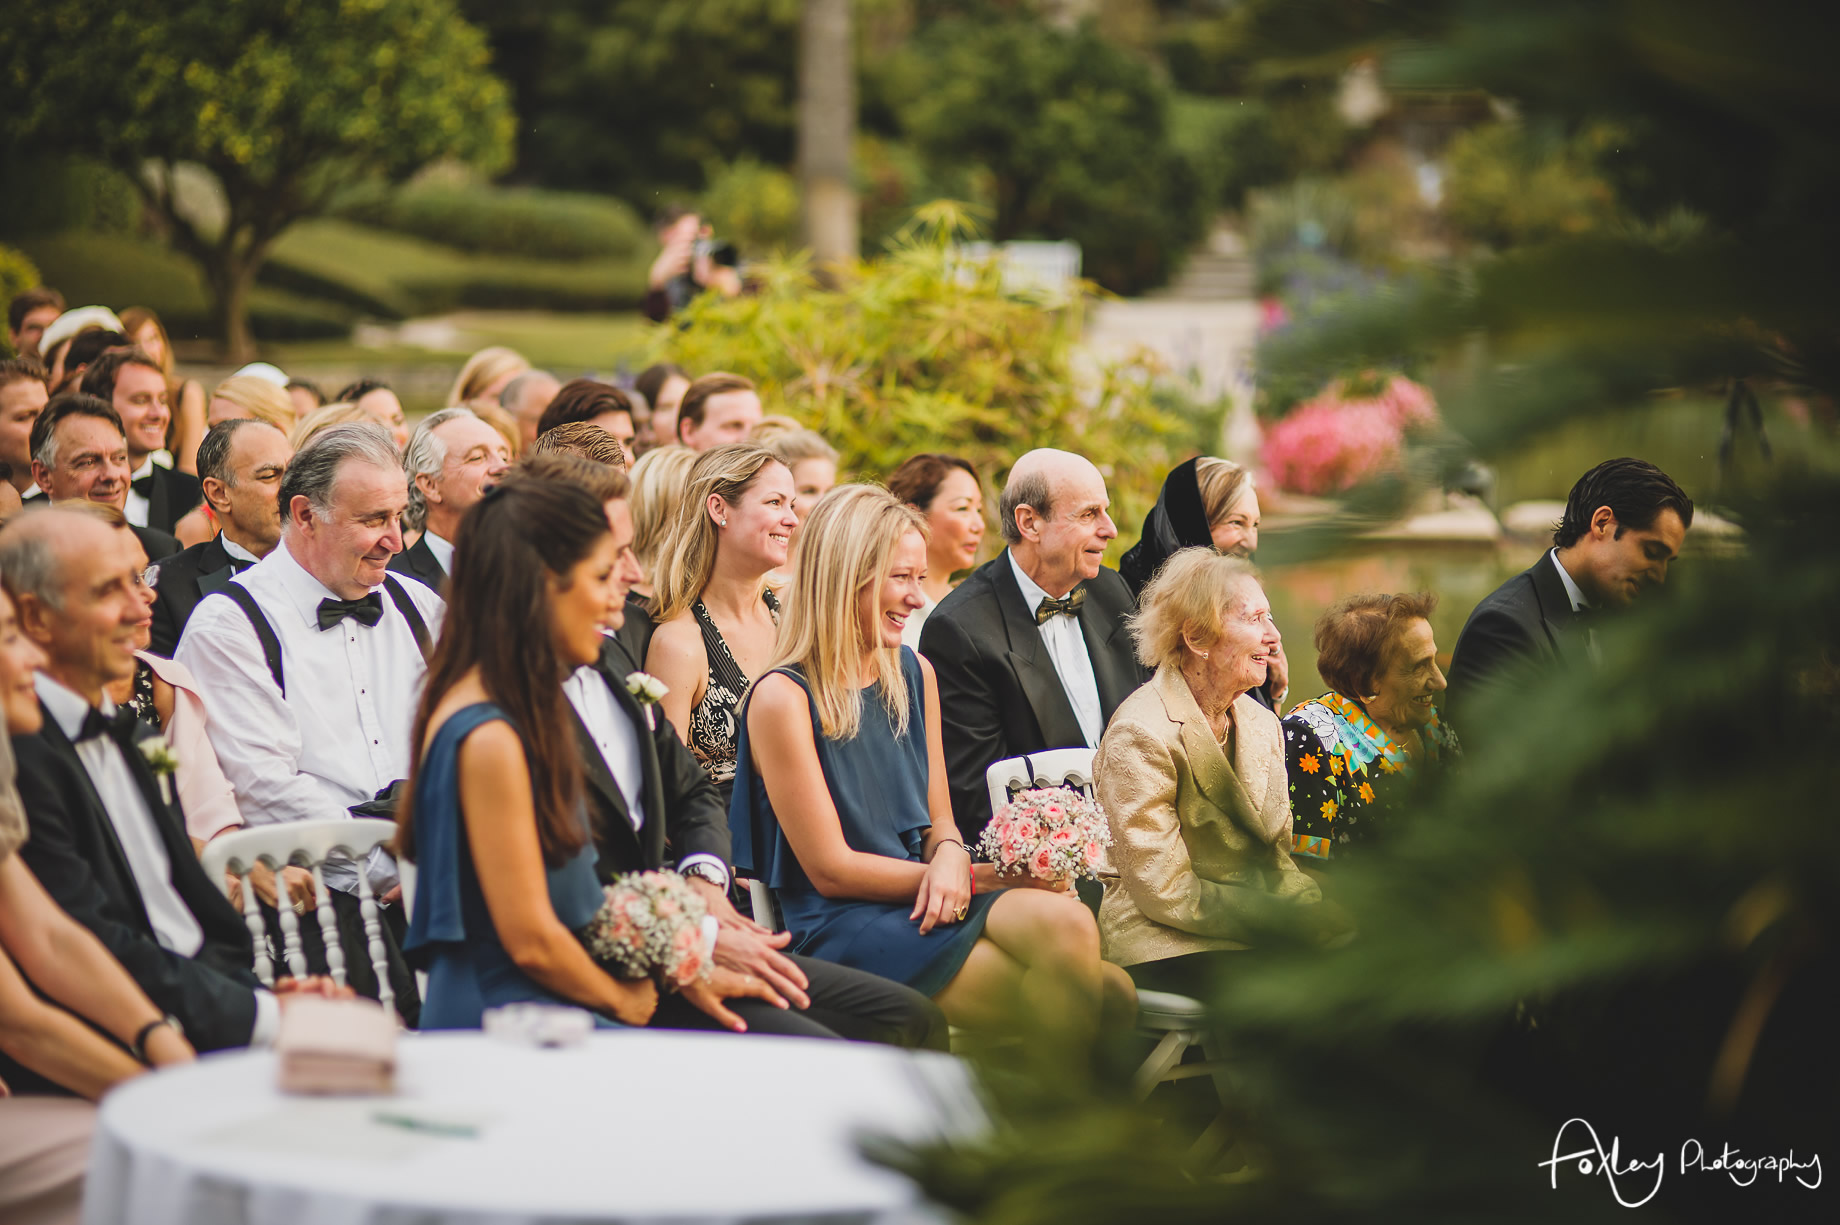 Jil and Will's Wedding at Villa Ephrussi De Rothschild 100